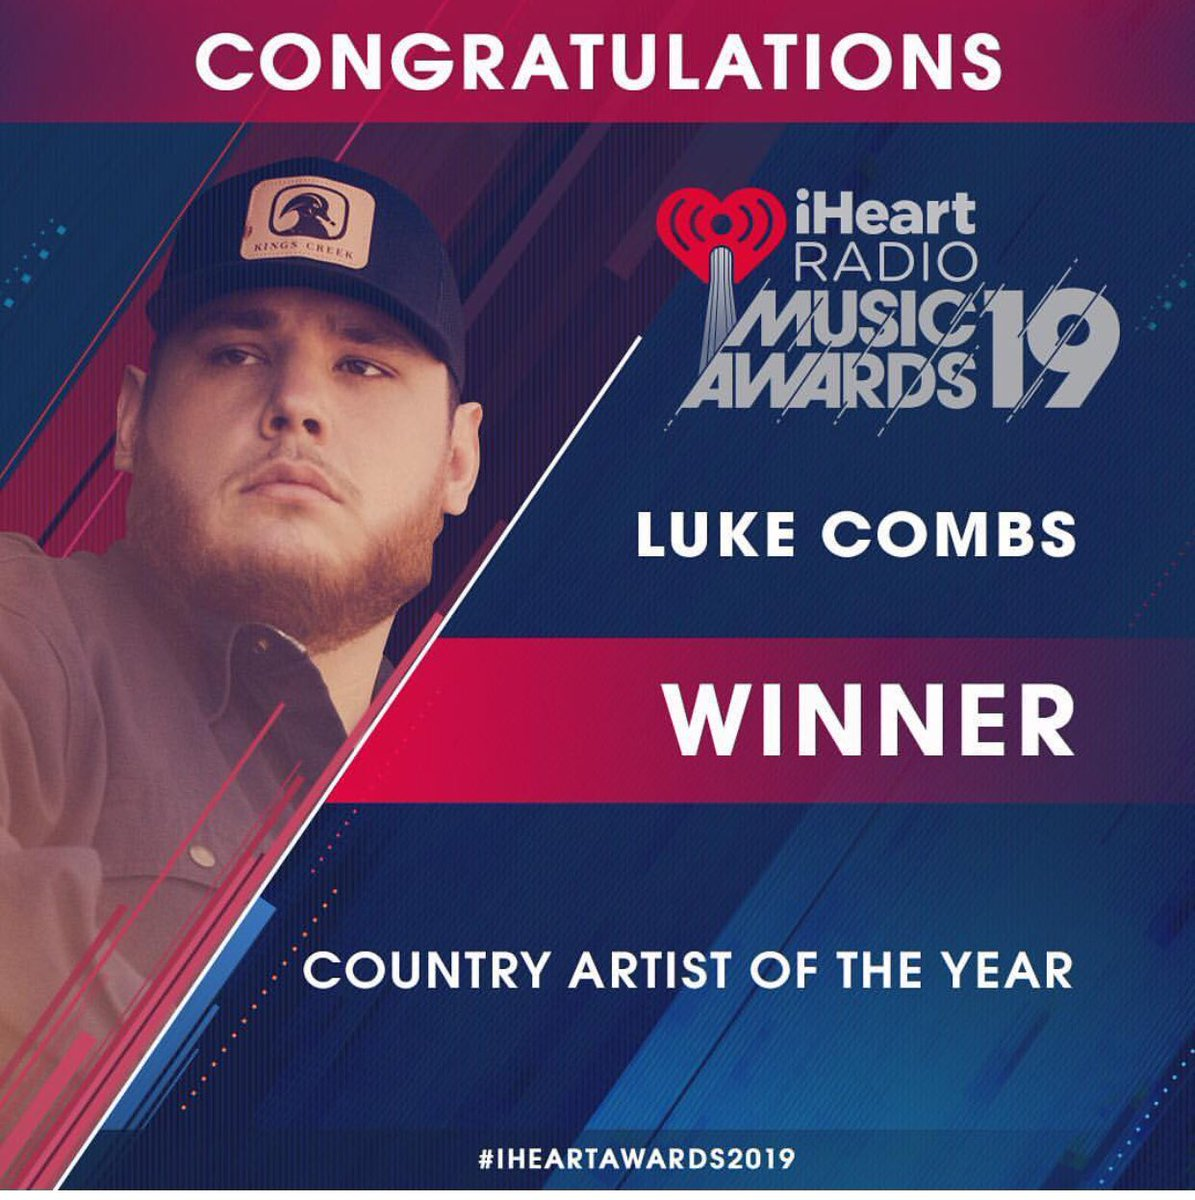 Luke Combs Updates's photo on Artist of the Year